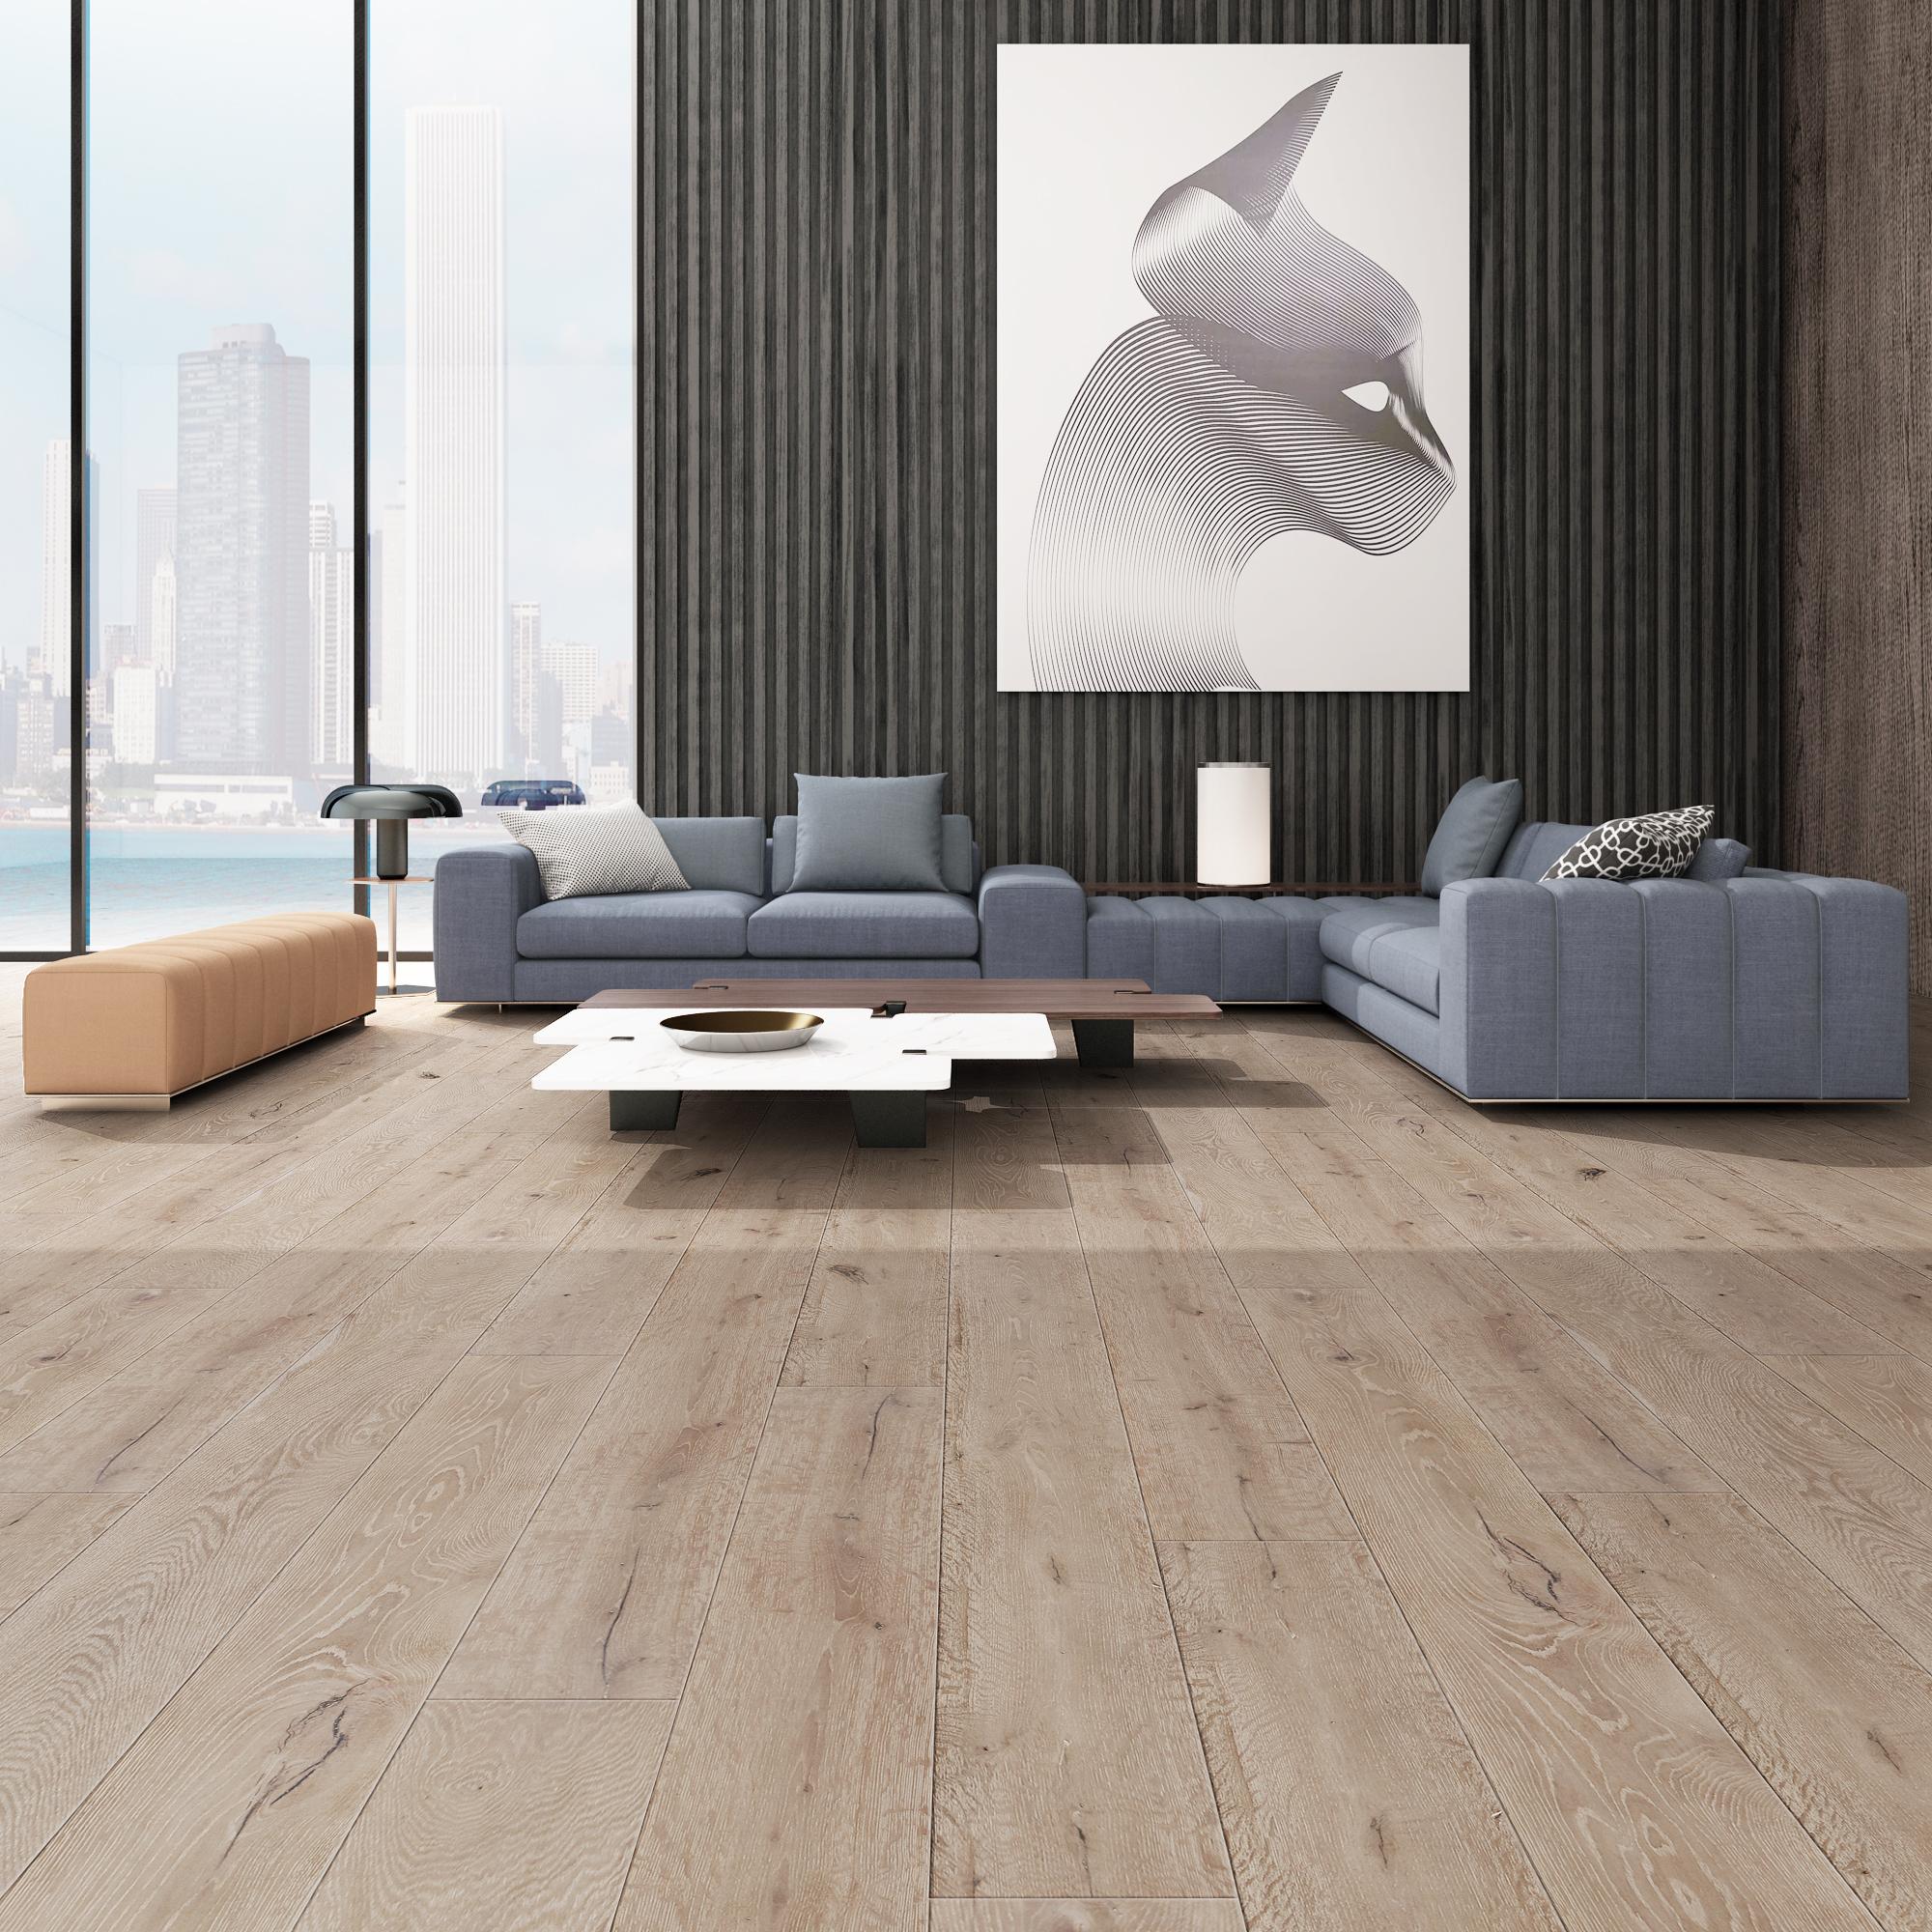 Lombardy_Living Room 1.jpg